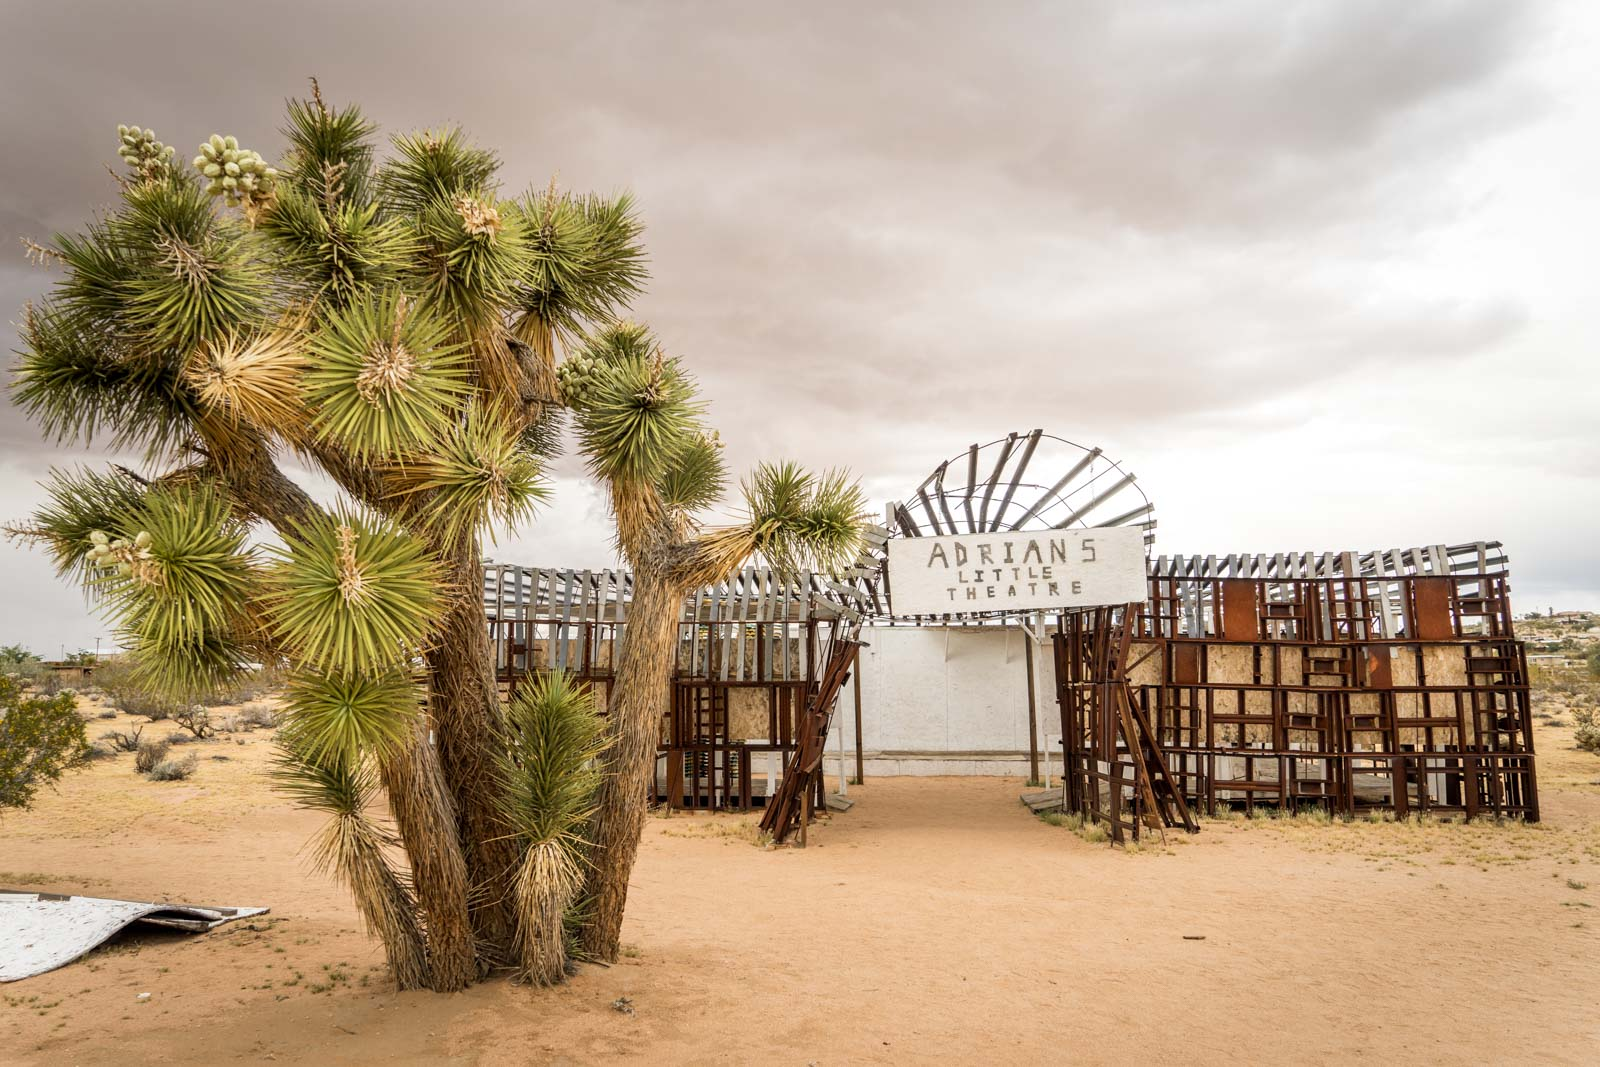 Noah Purifoy Desert Art Museum, Joshua Tree, California, USA